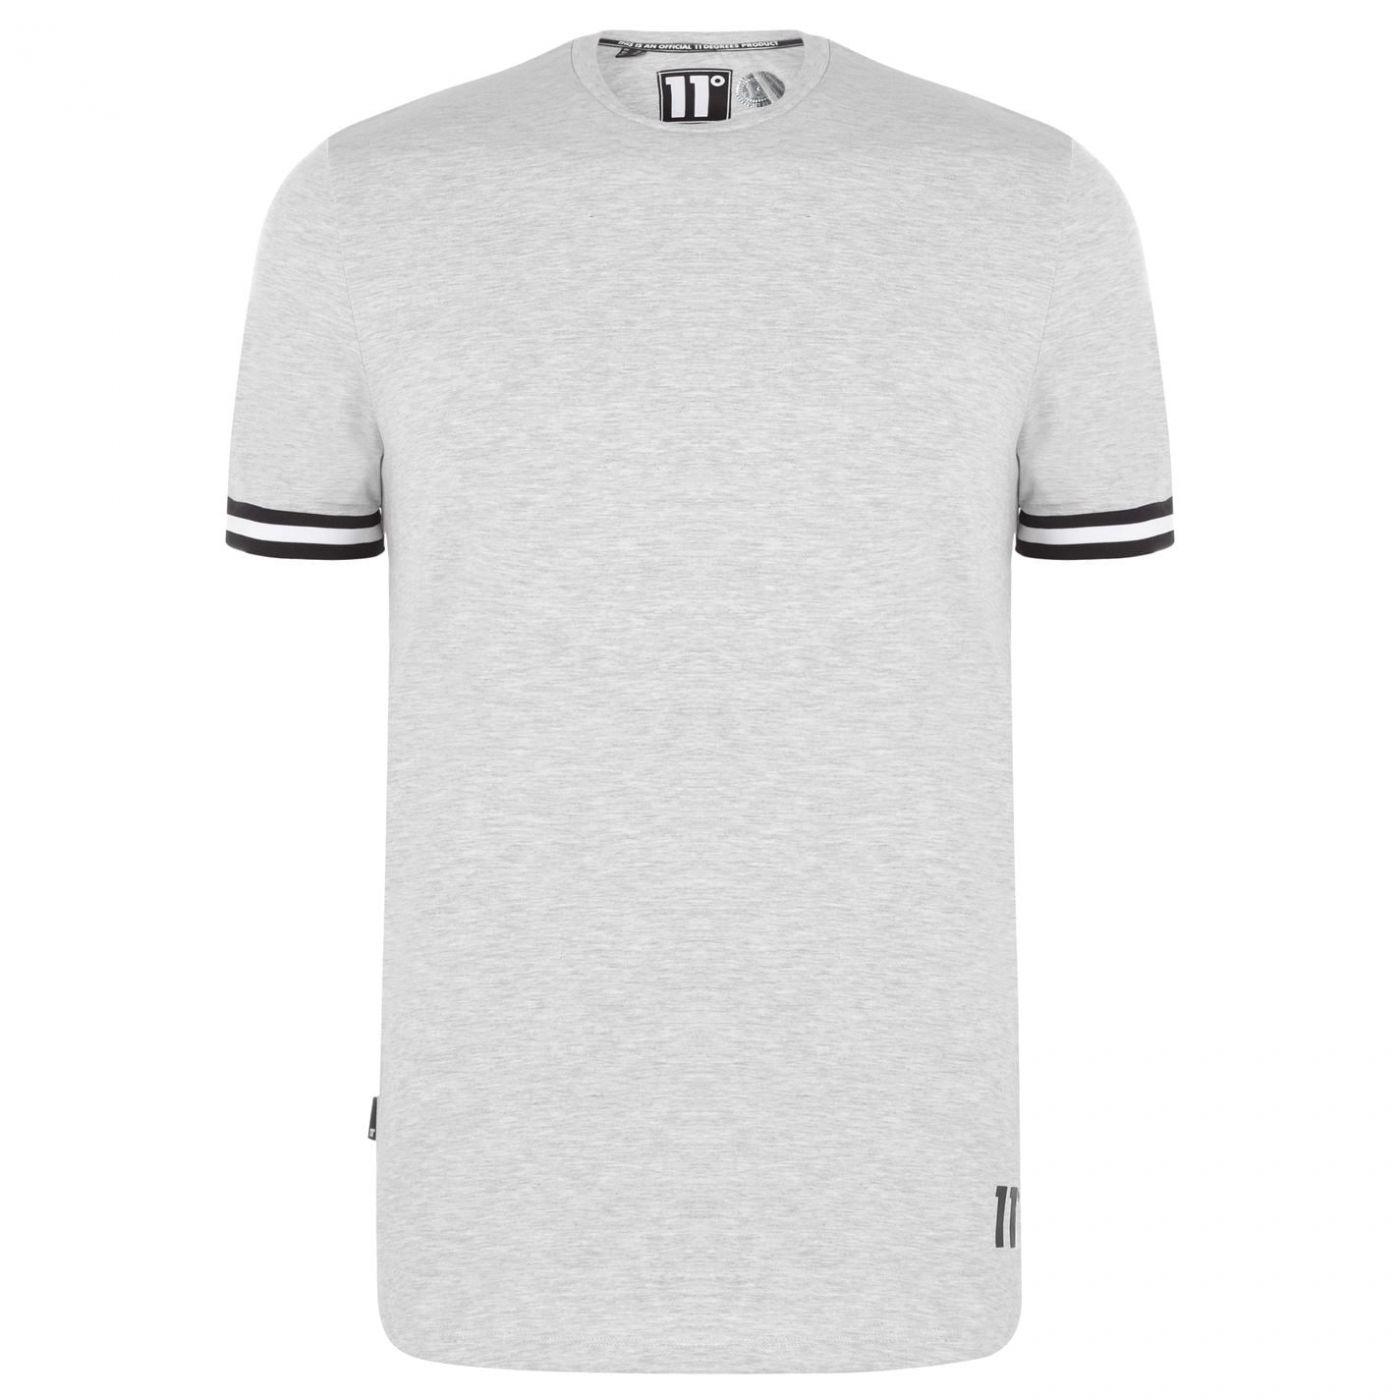 11 Degrees Sleeve T-Shirt